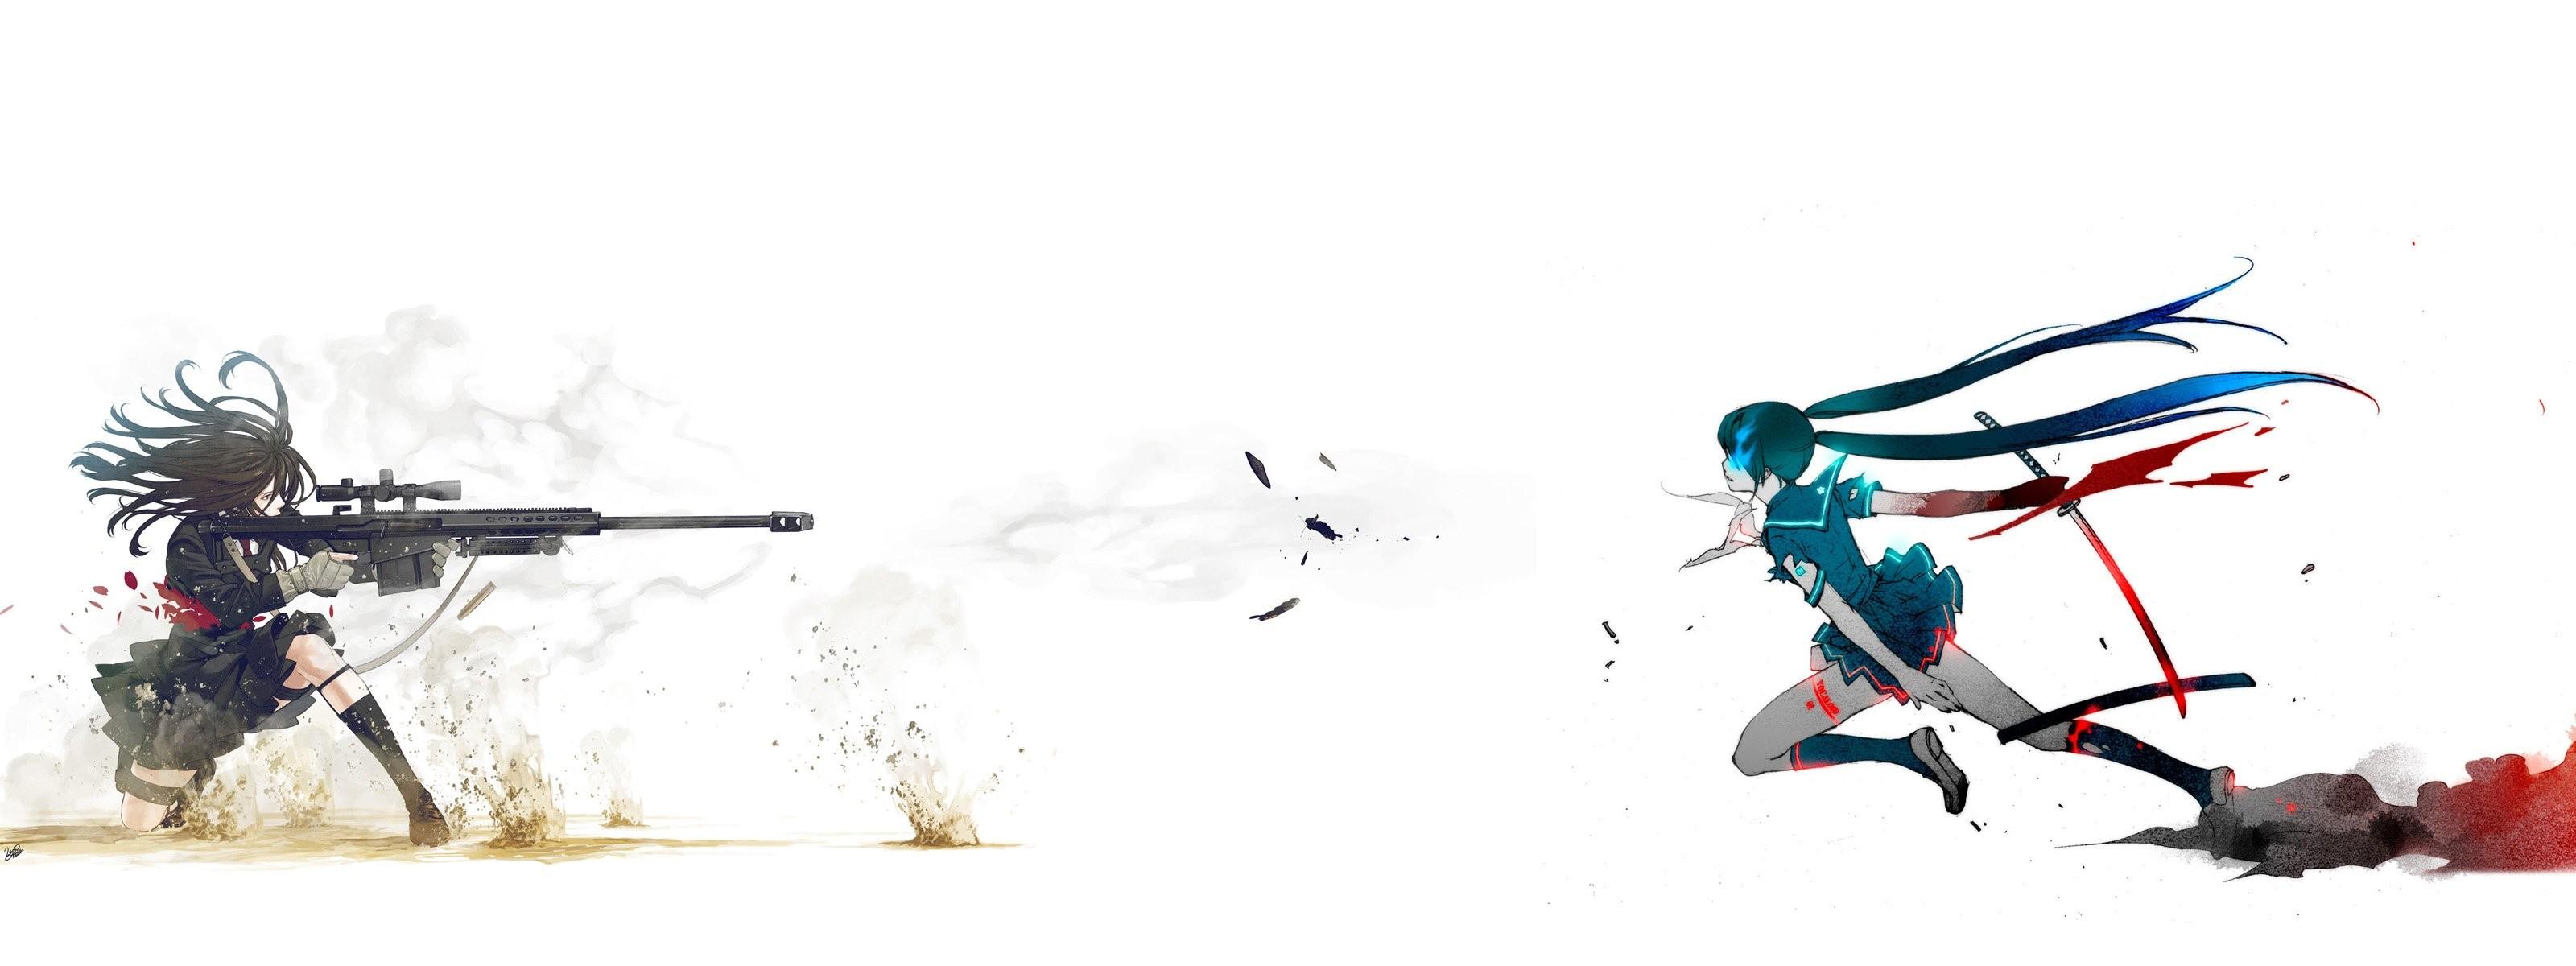 Free Wallpapers – wonderfful woman anime sniper wallpaper   neat .